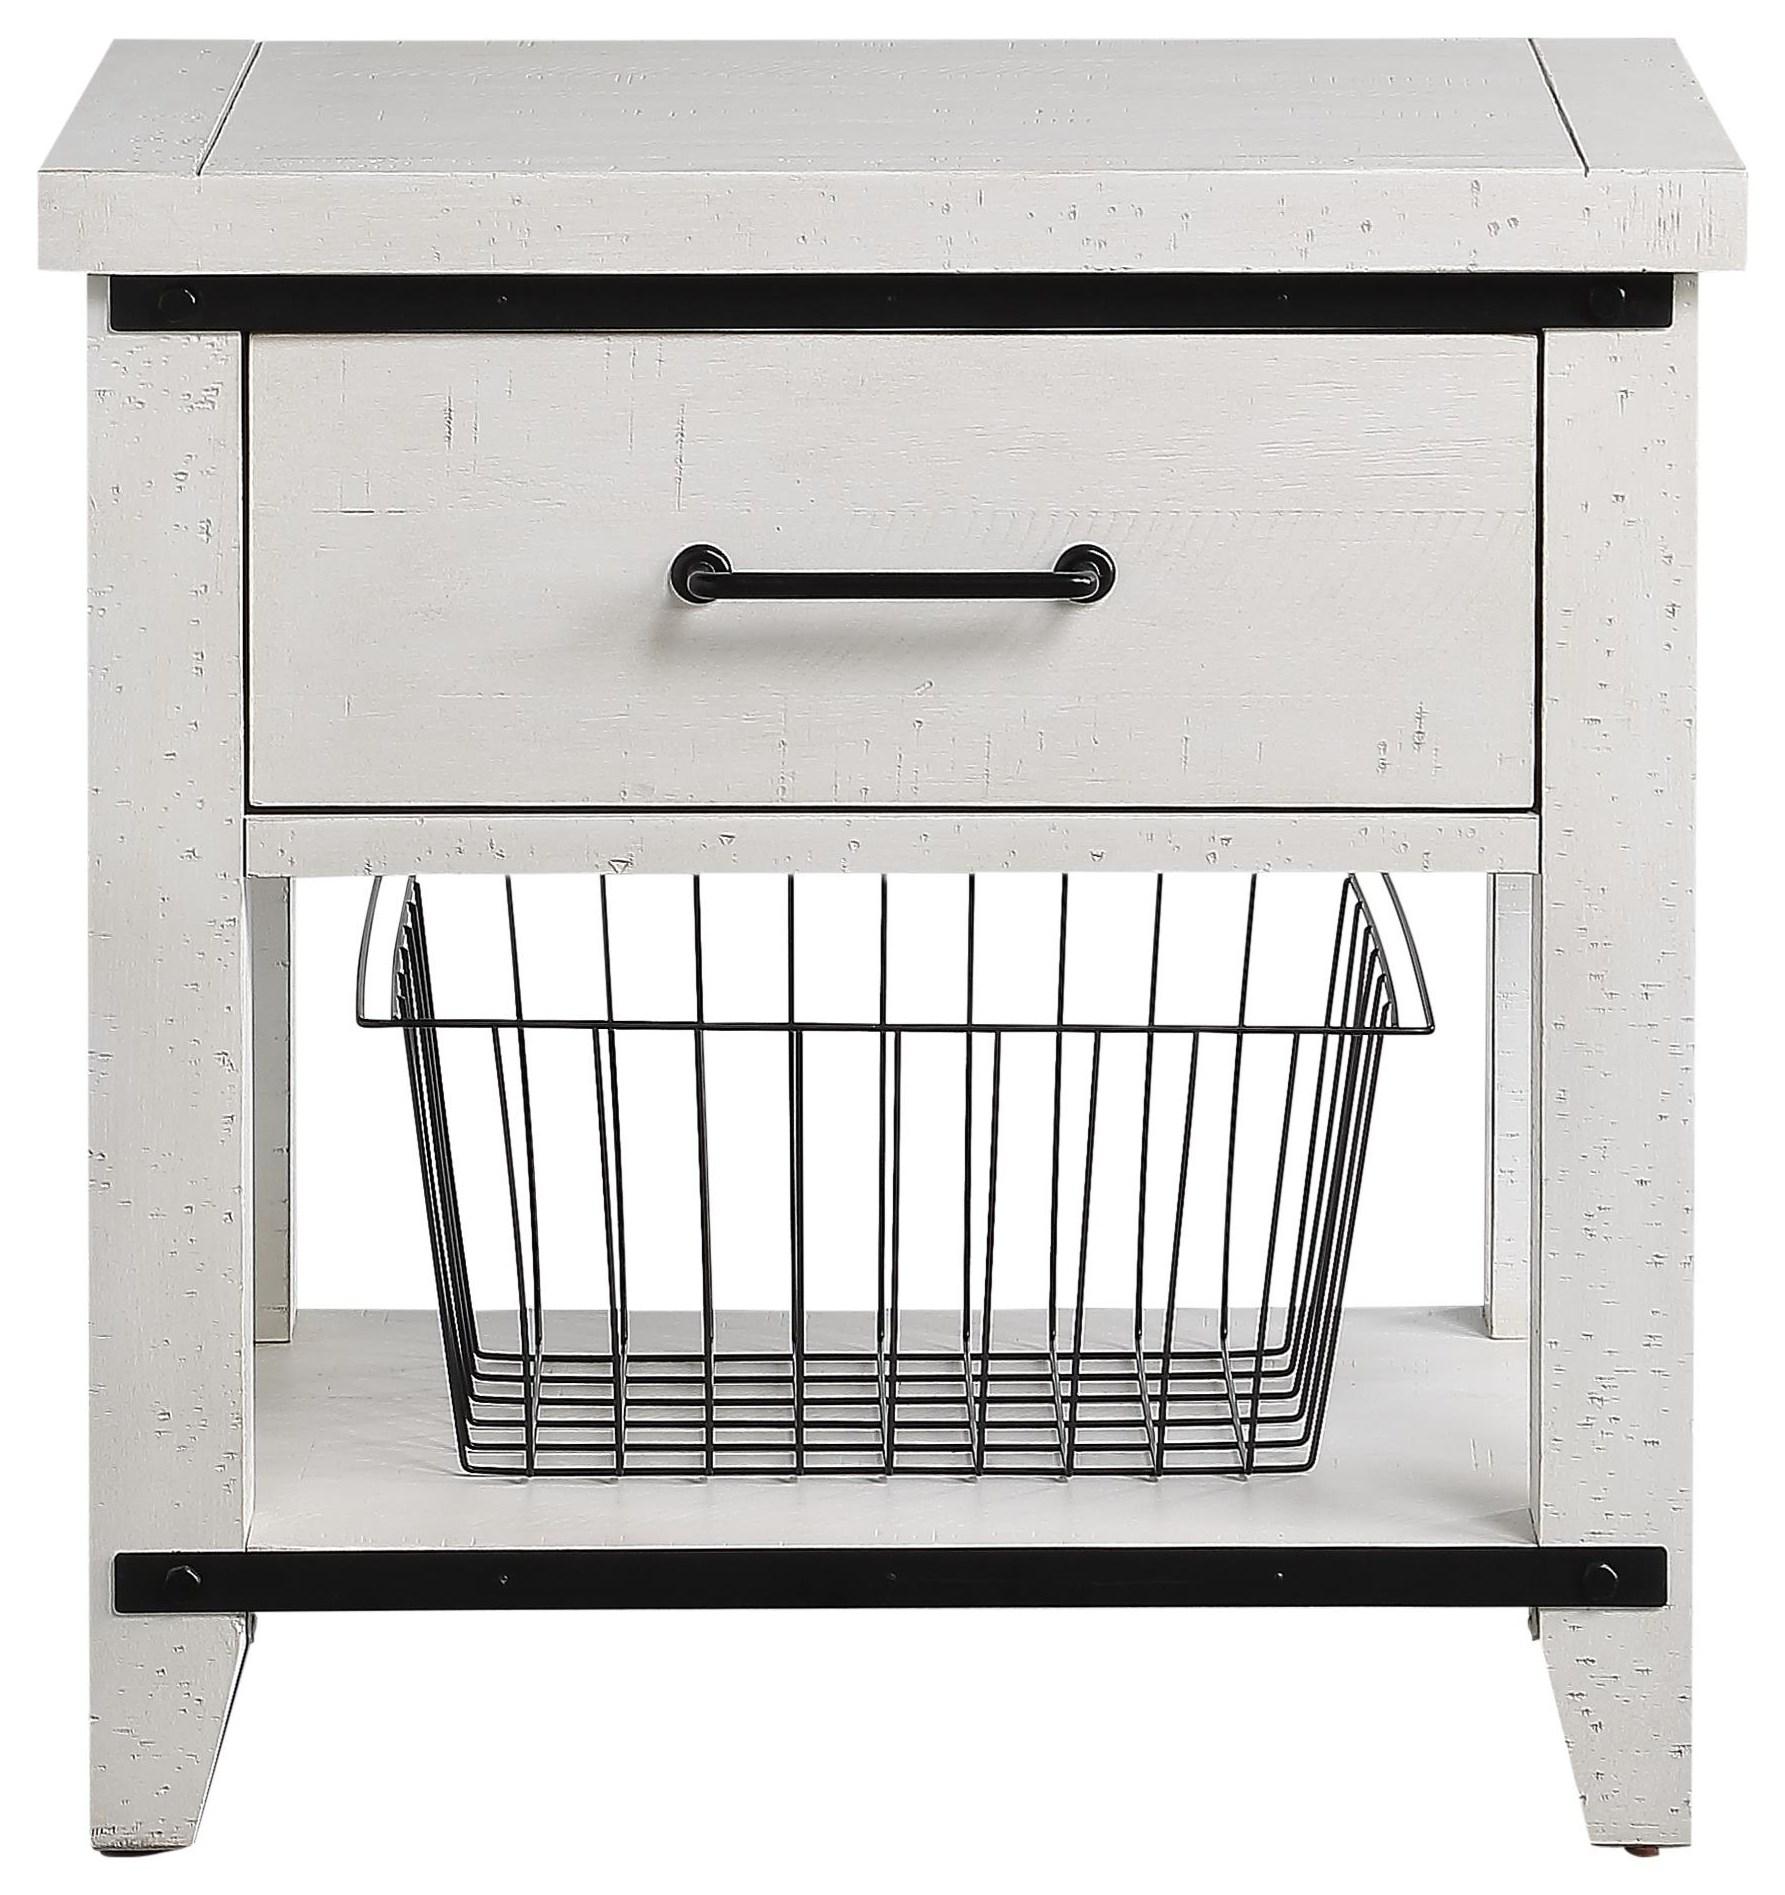 Dakota 1 Drawer Nightstand W/Basket by HH at Walker's Furniture